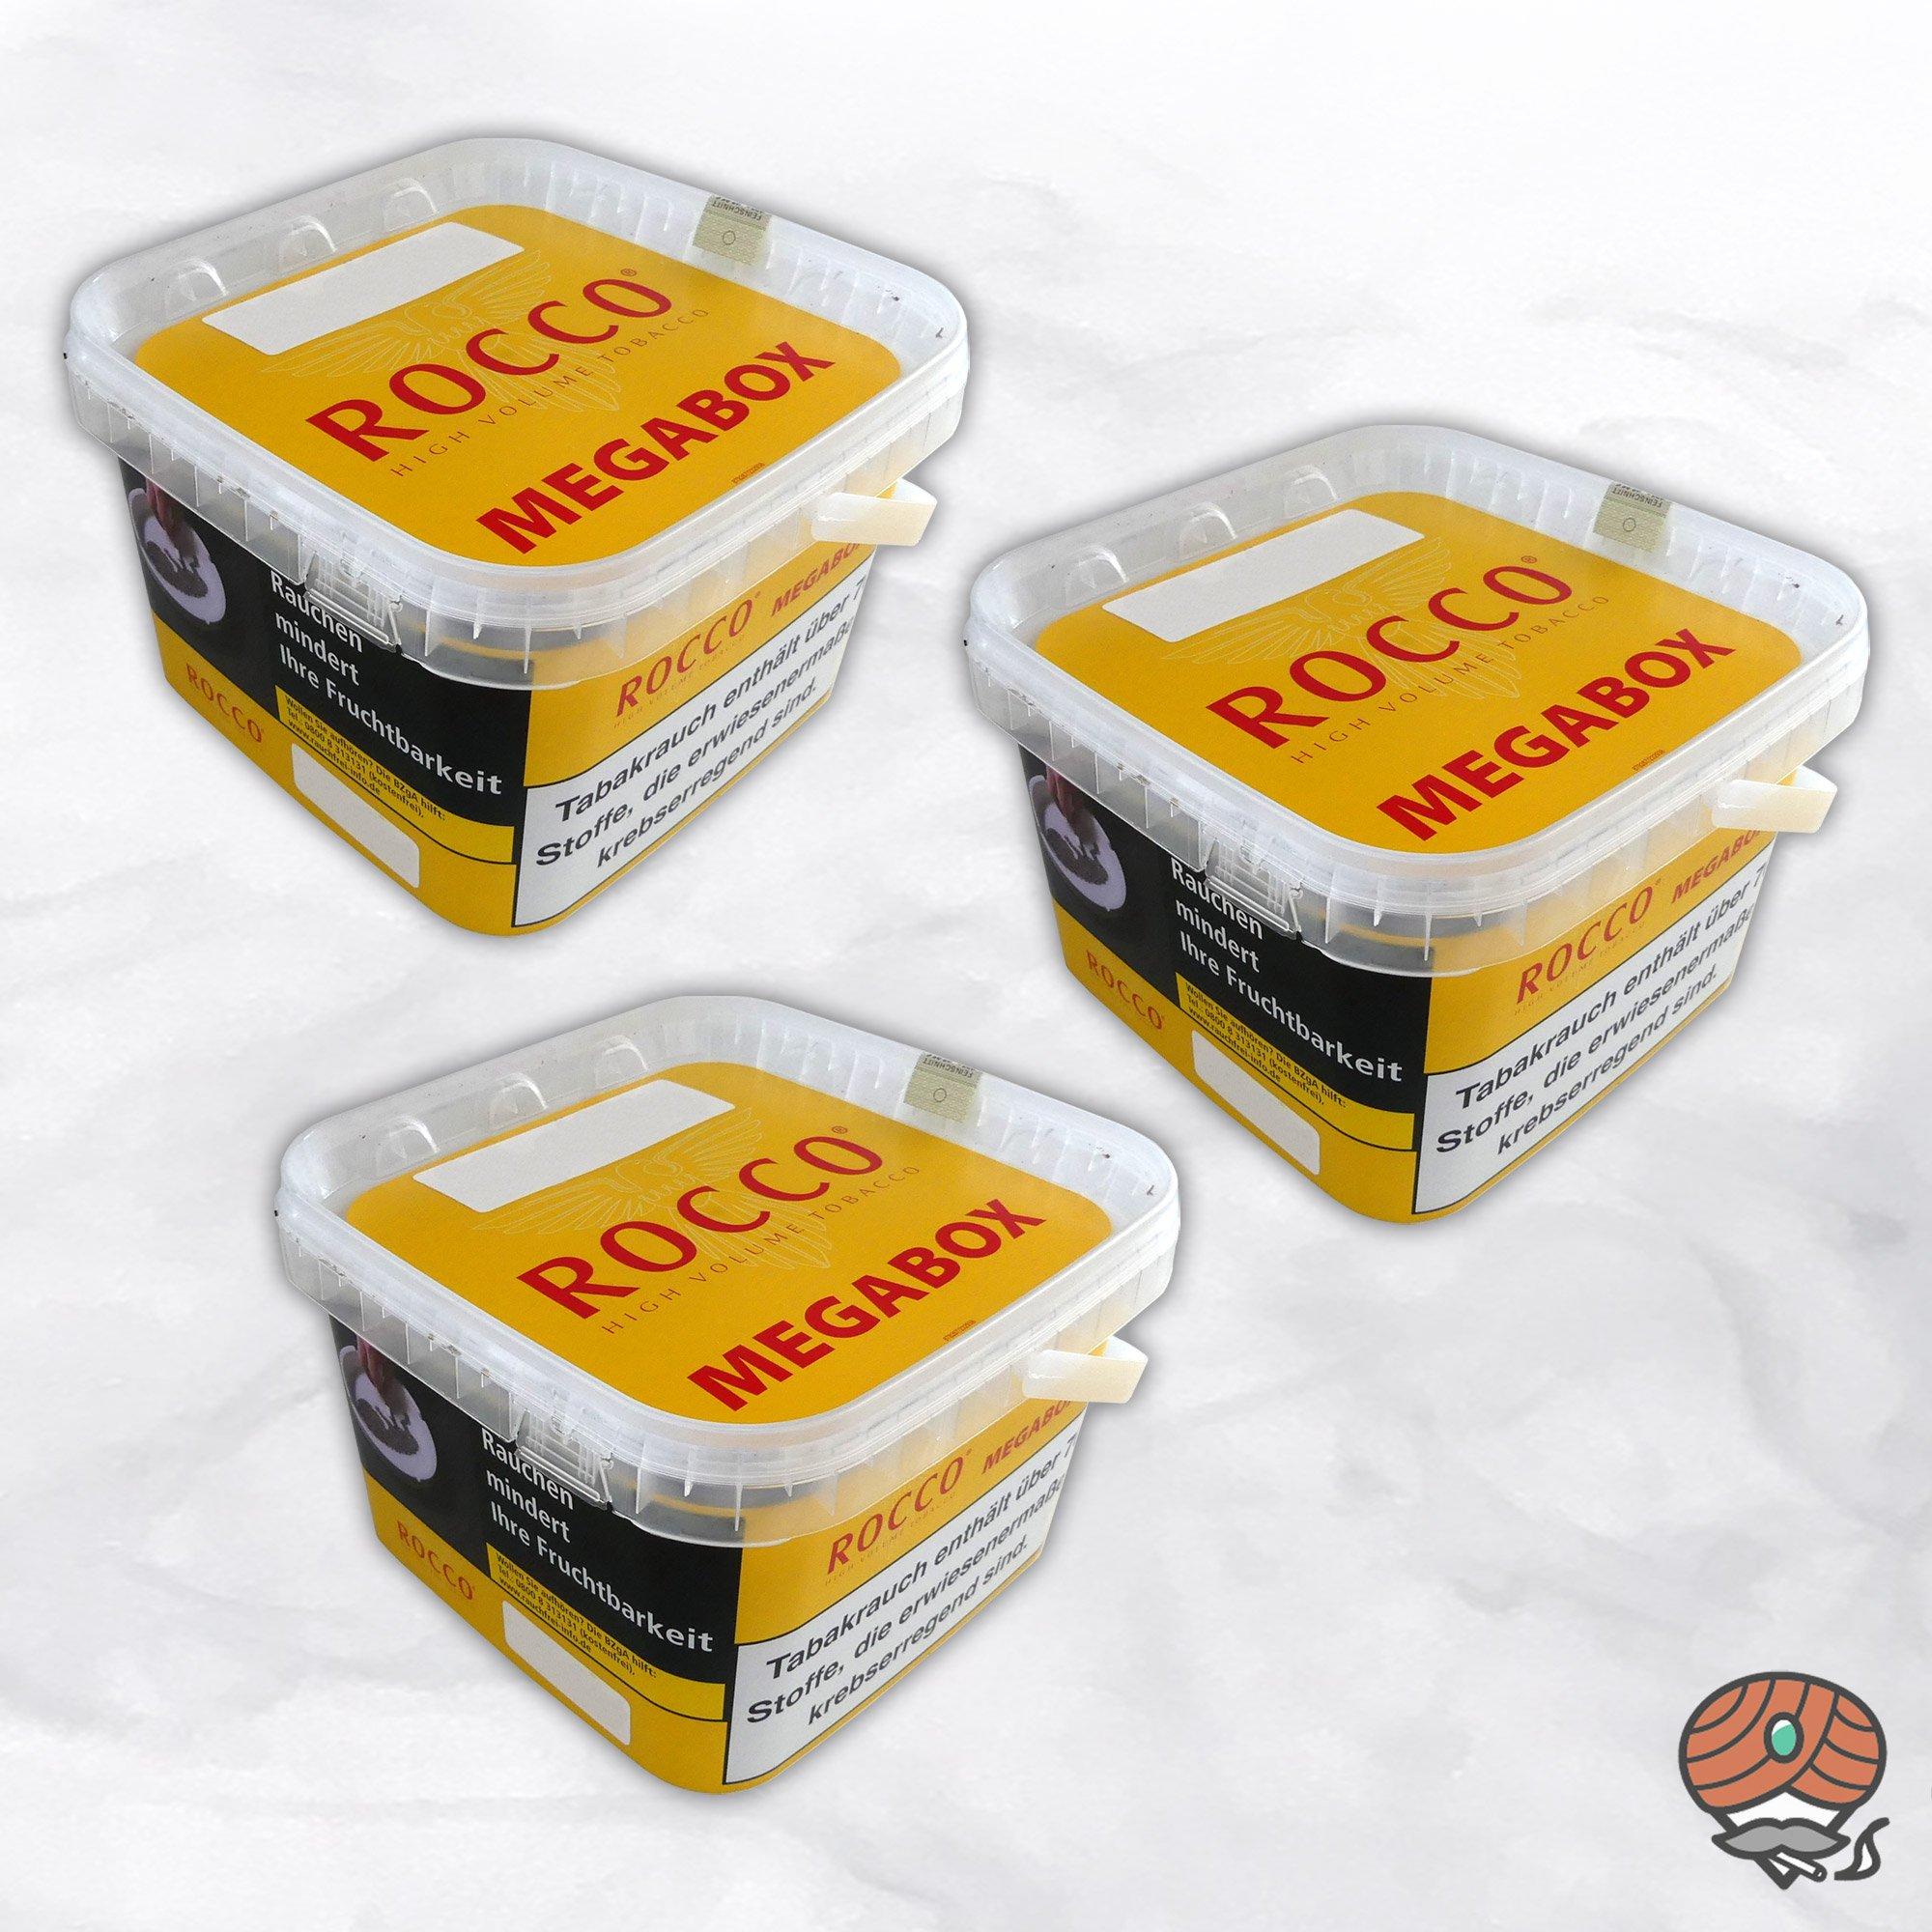 3 x ROCCO Tabak / Volumentabak Gelb Megabox 210 g